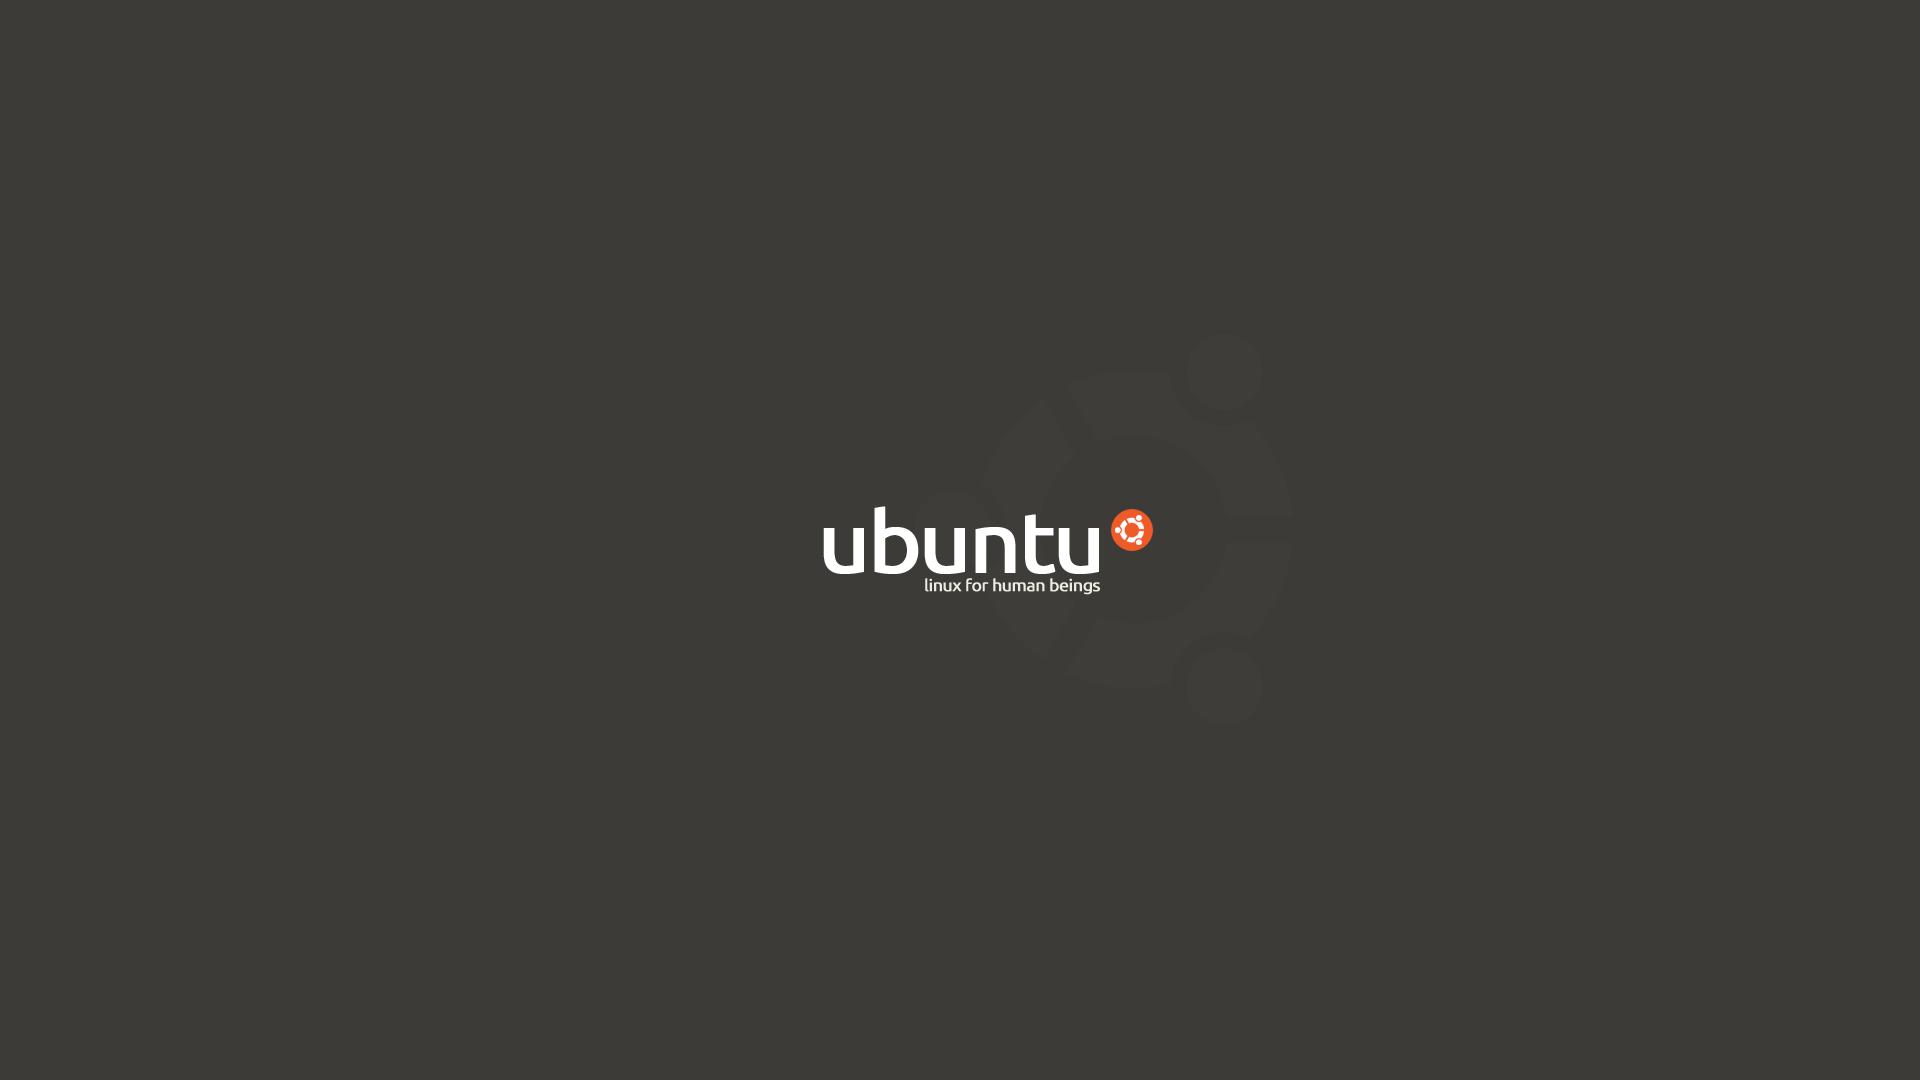 Ubuntu Wallpaper 1920x1080 Images Pictures   Becuo 1920x1080